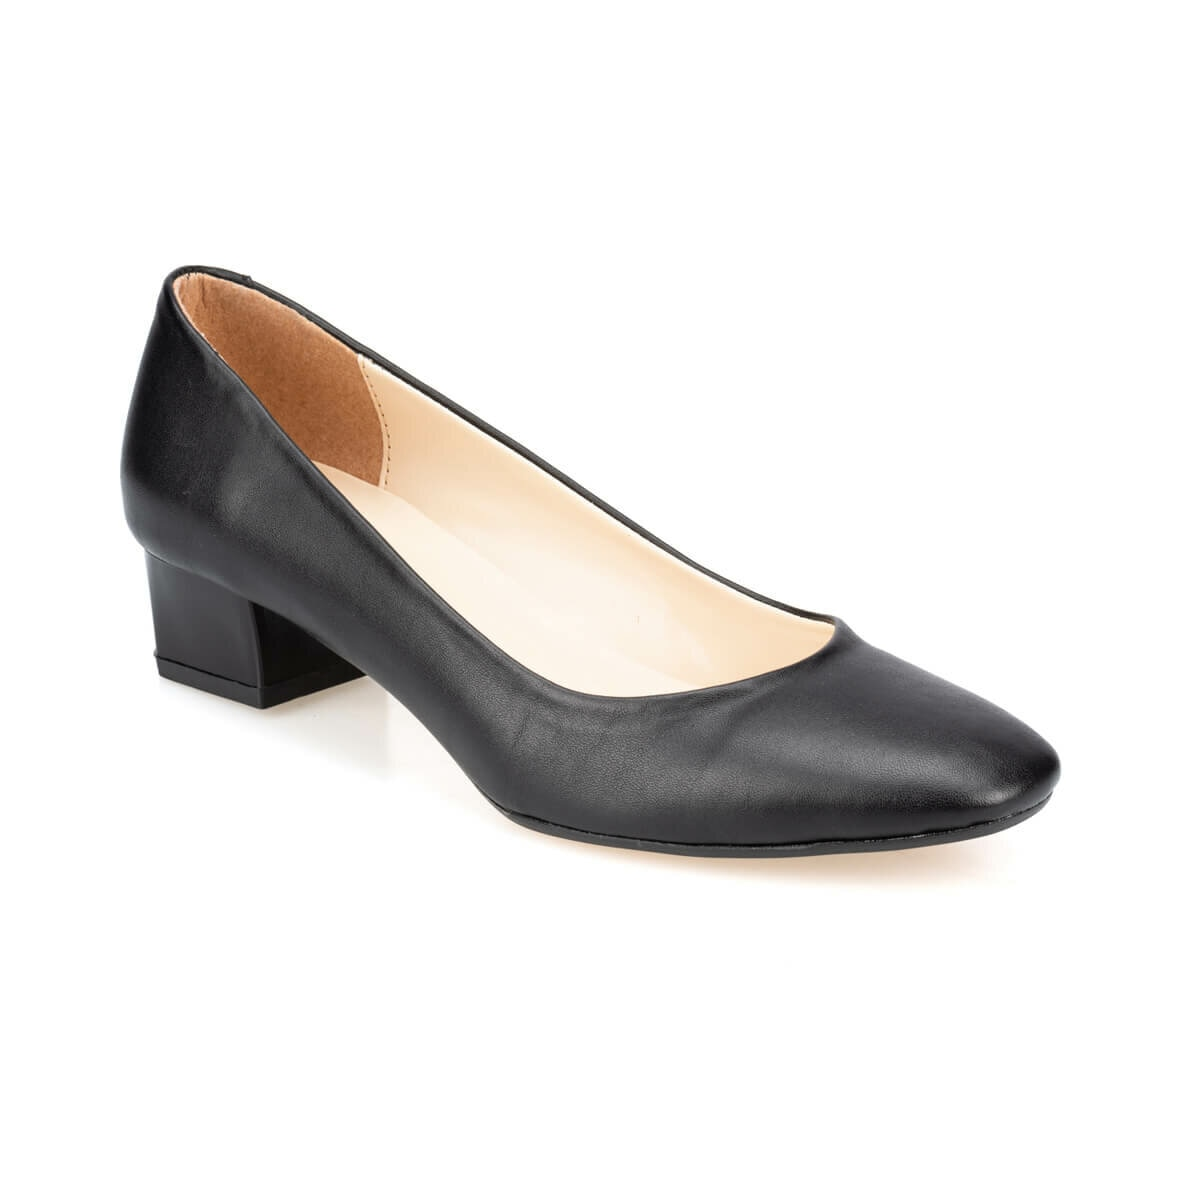 FLO 91,312079. Z negro mujer Gova zapatos Polaris